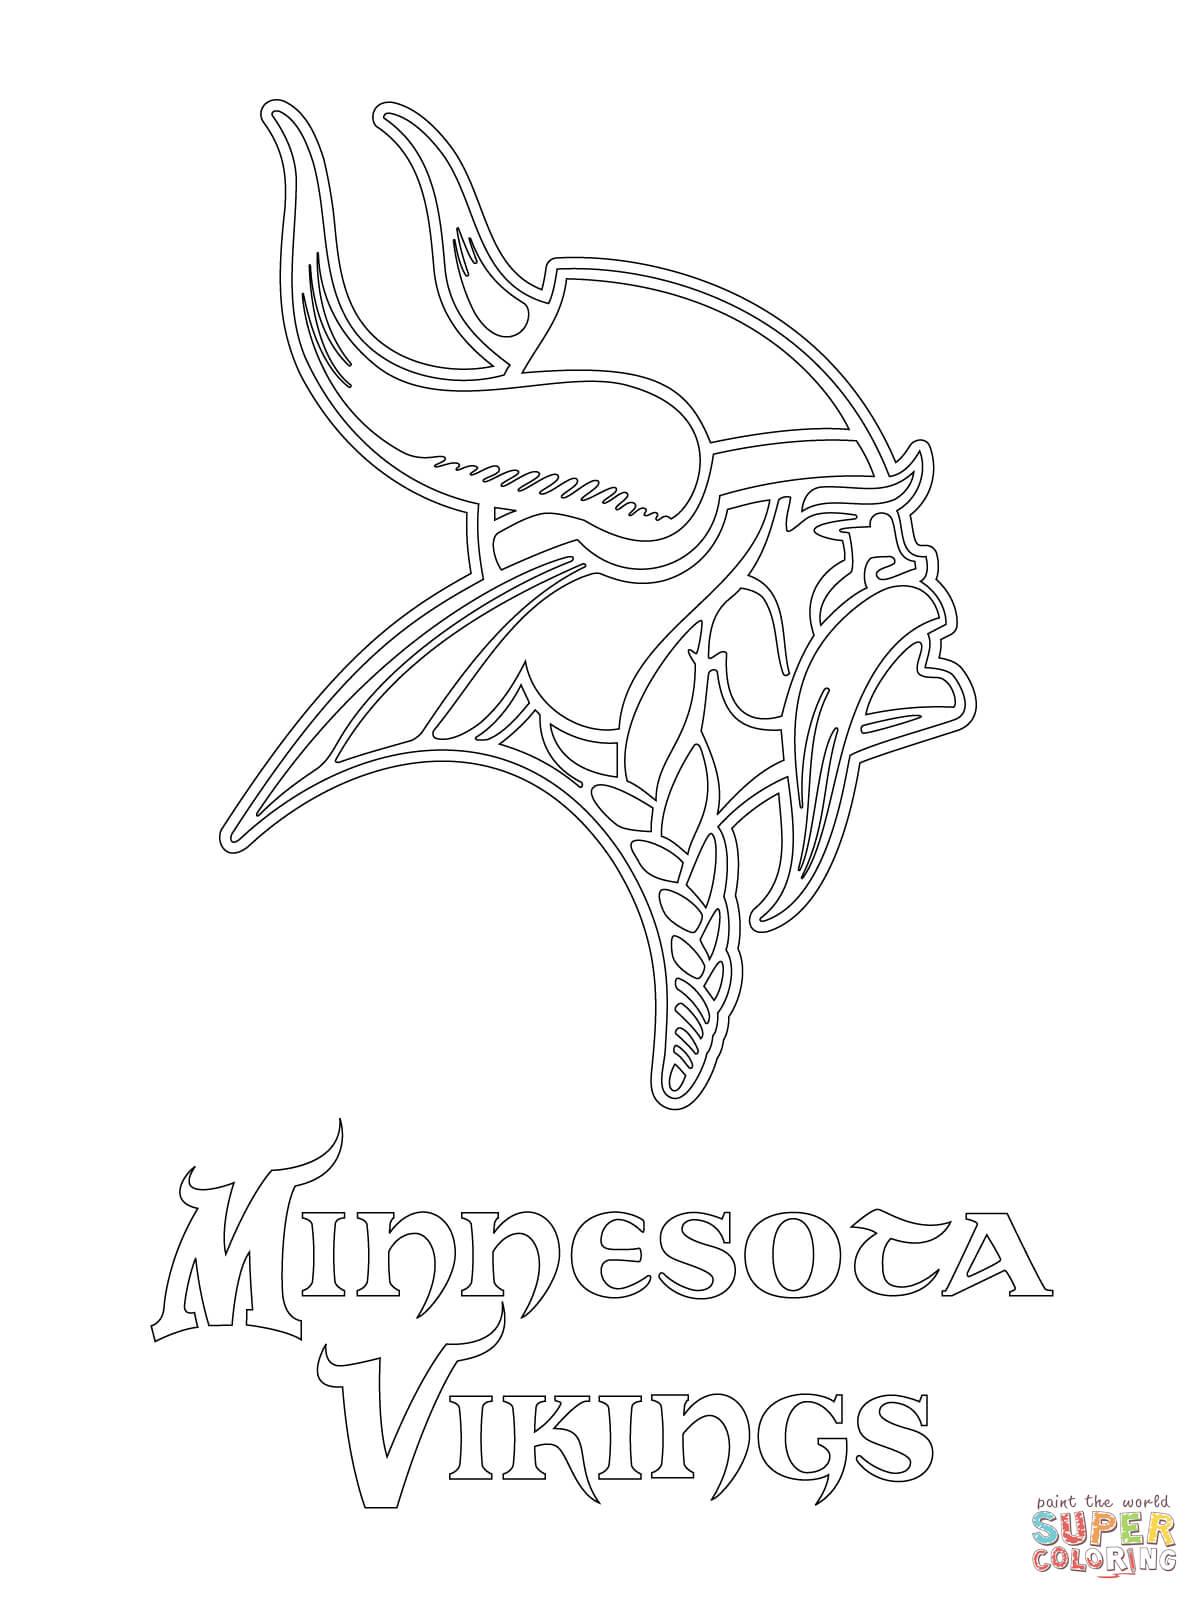 1200x1600 minnesota vikings logo coloring page free printable coloring